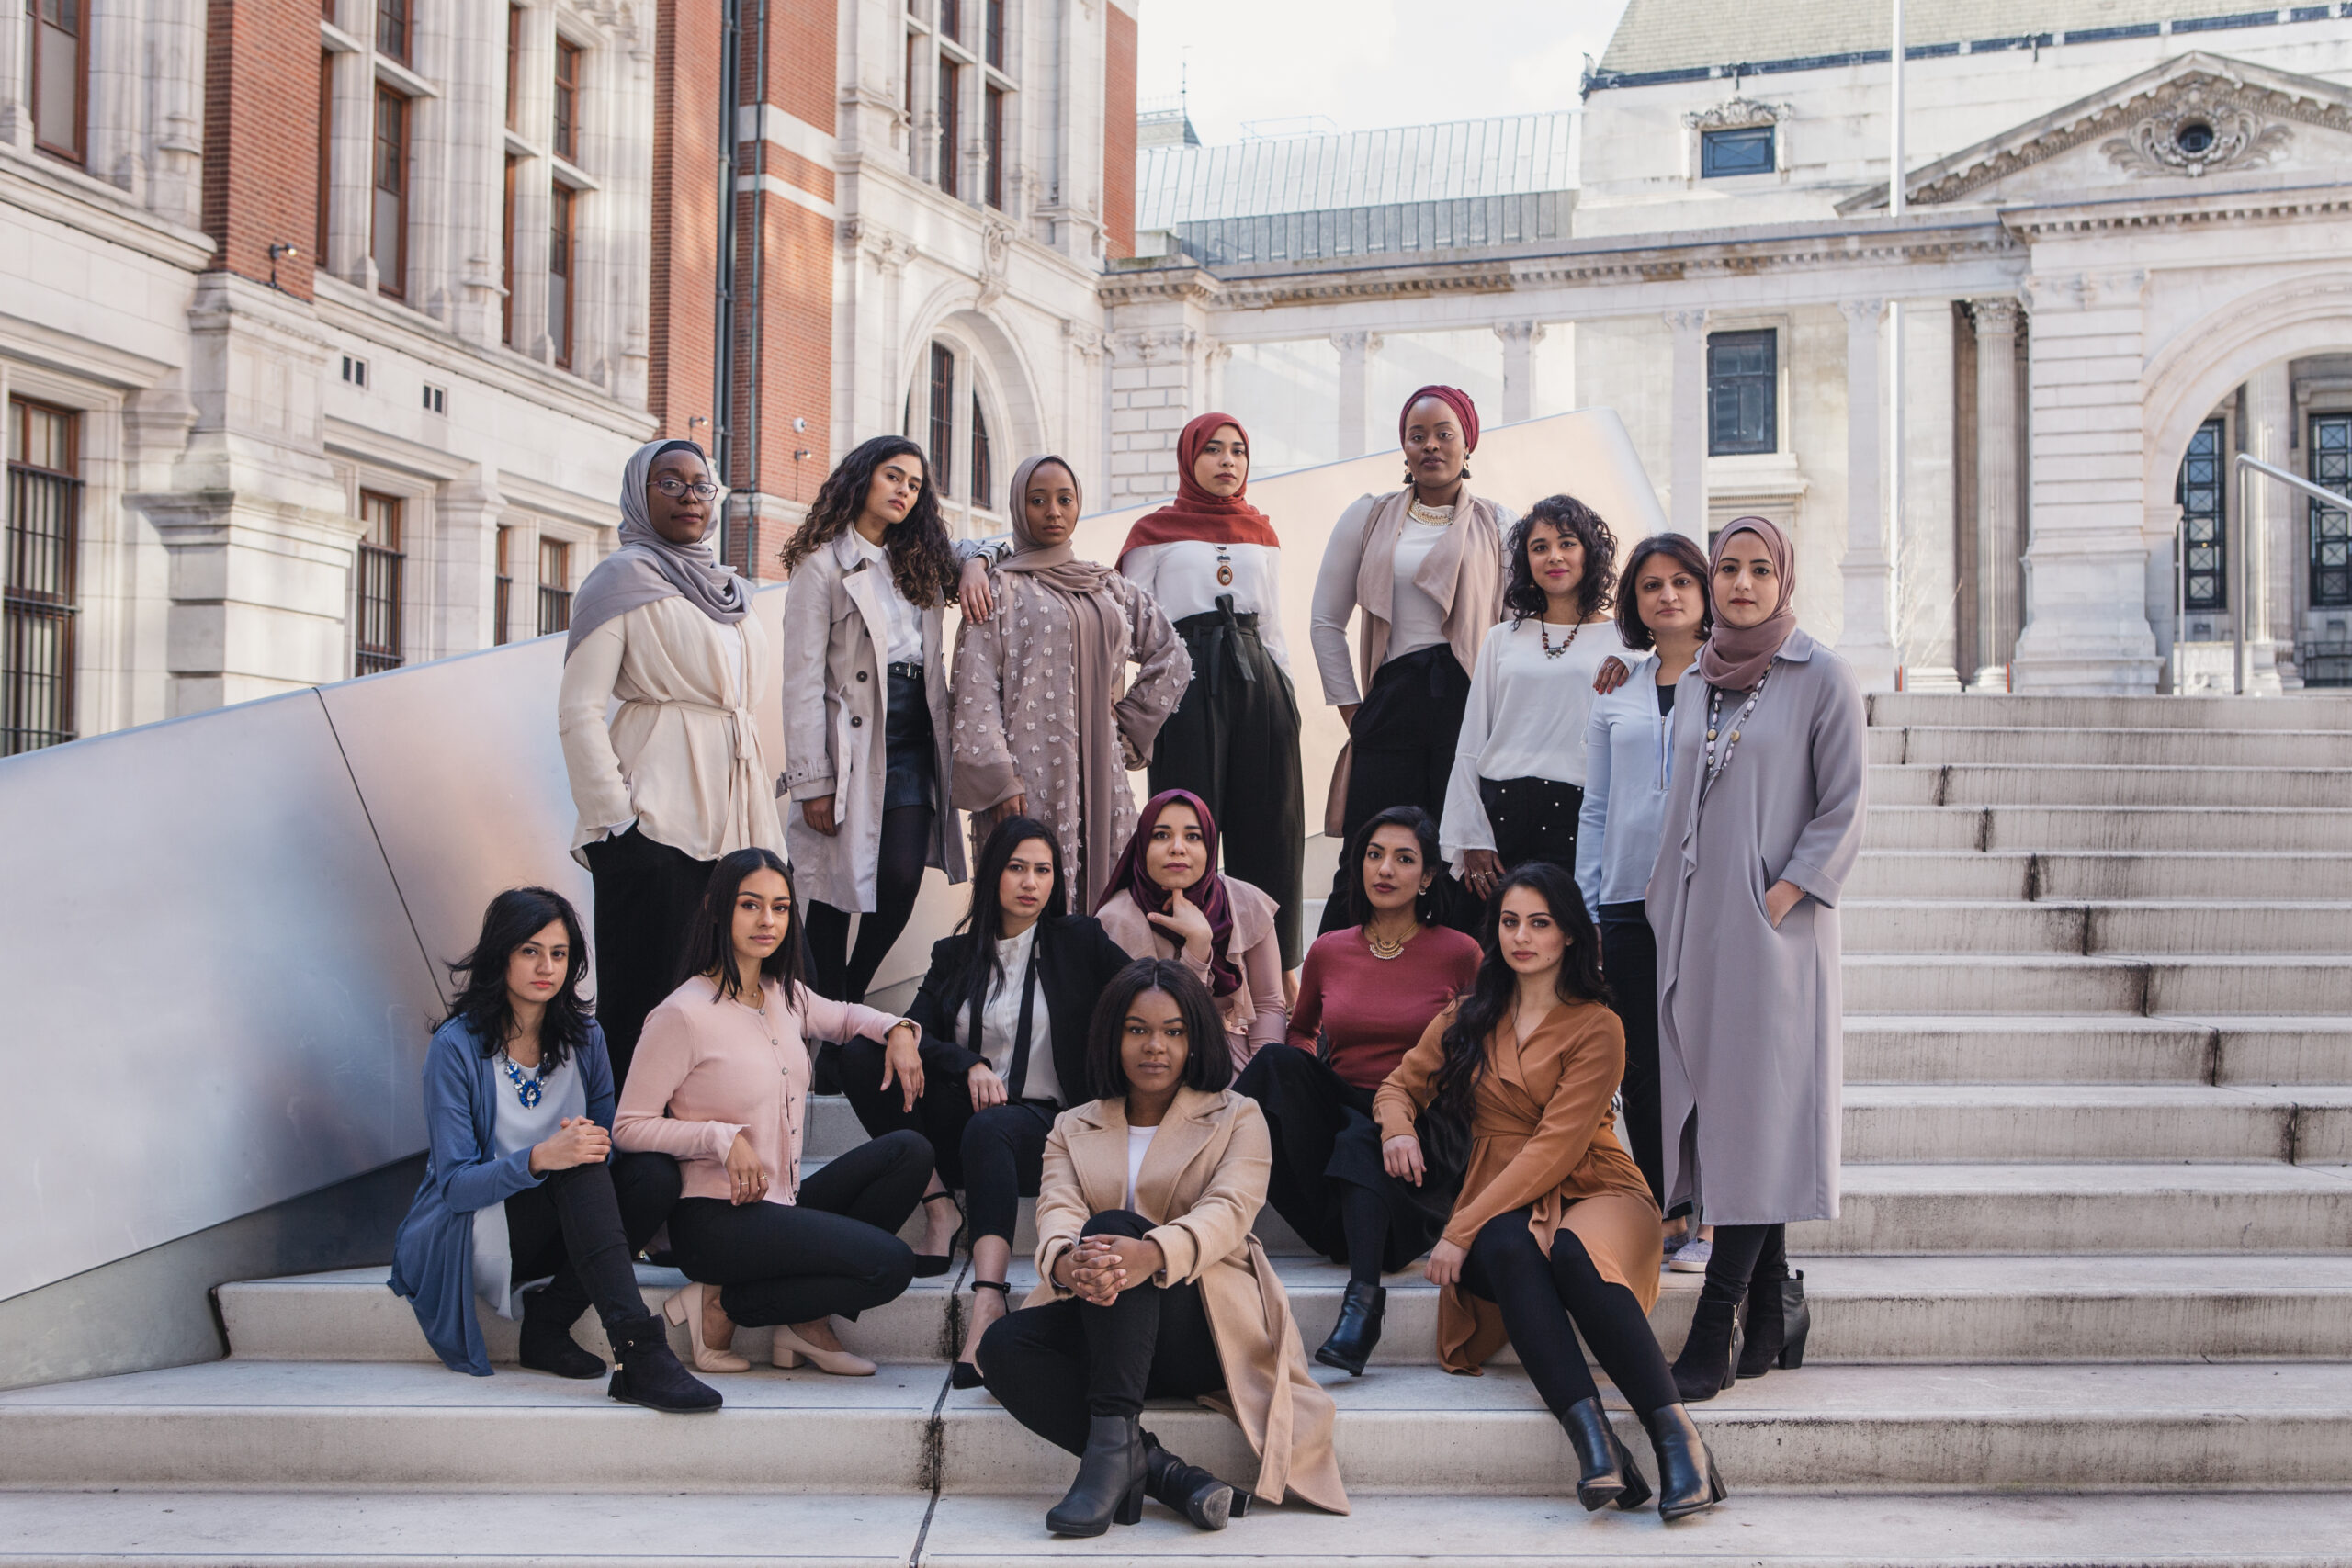 Trailblazing Muslim Women – introducing Zainab Khan and Maaria Lohiya